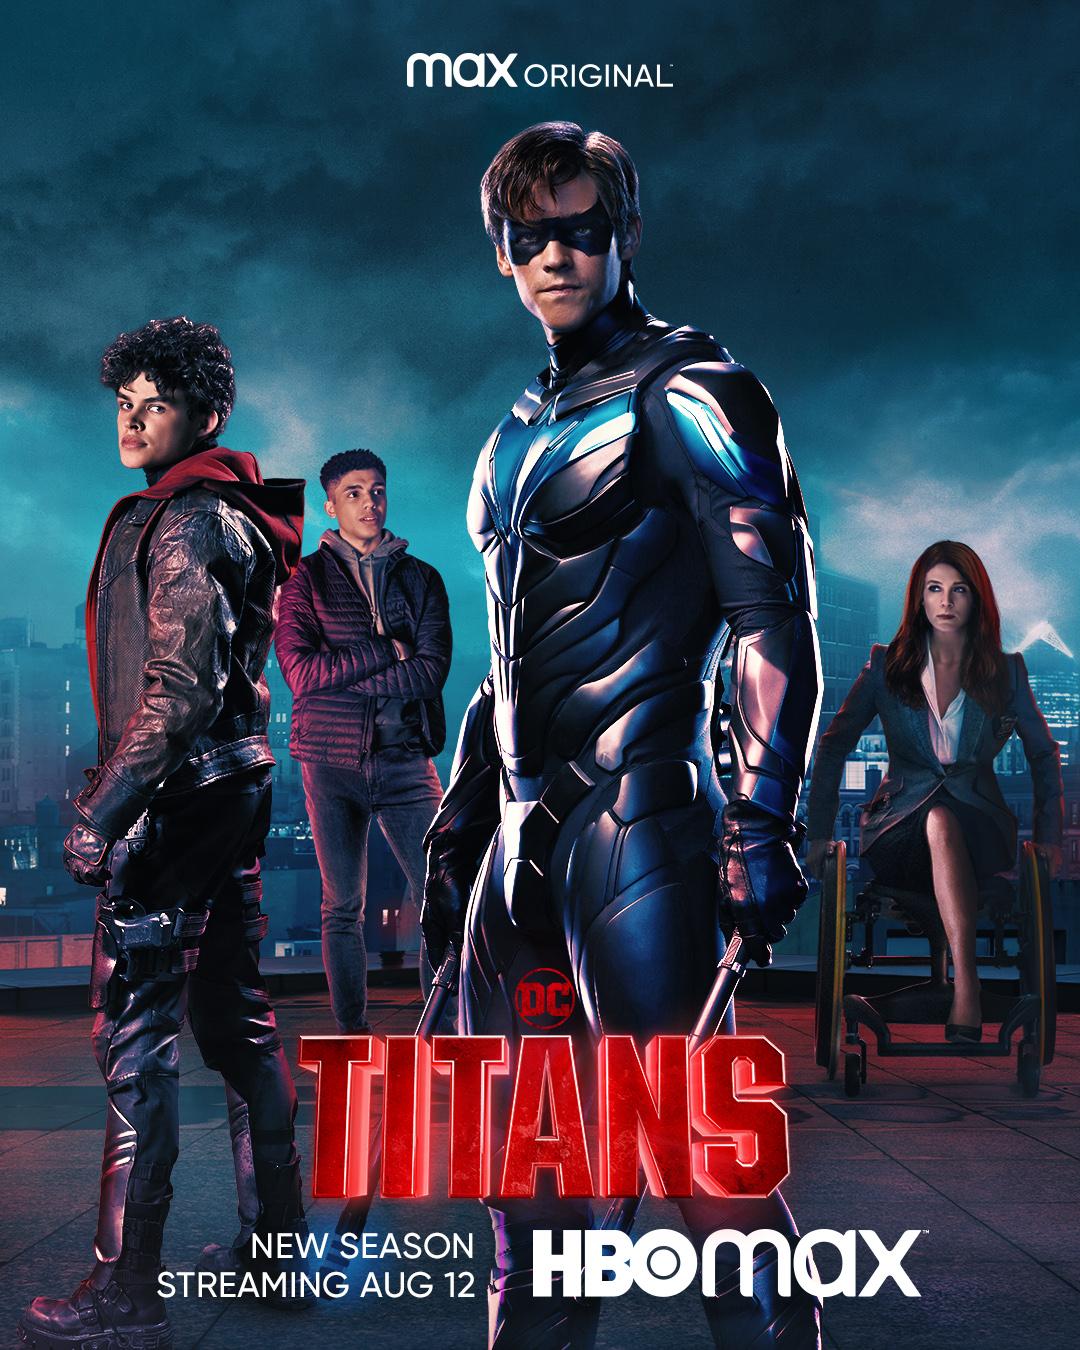 Jason Todd/Red Hood (Curran Walters), Tim Drake (Jay Lycurgo), Dick Grayson/Nightwing (Brenton Thwaites) y Barbara Gordon (Savannah Welch) en un póster promocional de la temporada 3 de Titans. Imagen: DC Titans on Max Twitter (@DCTitans).